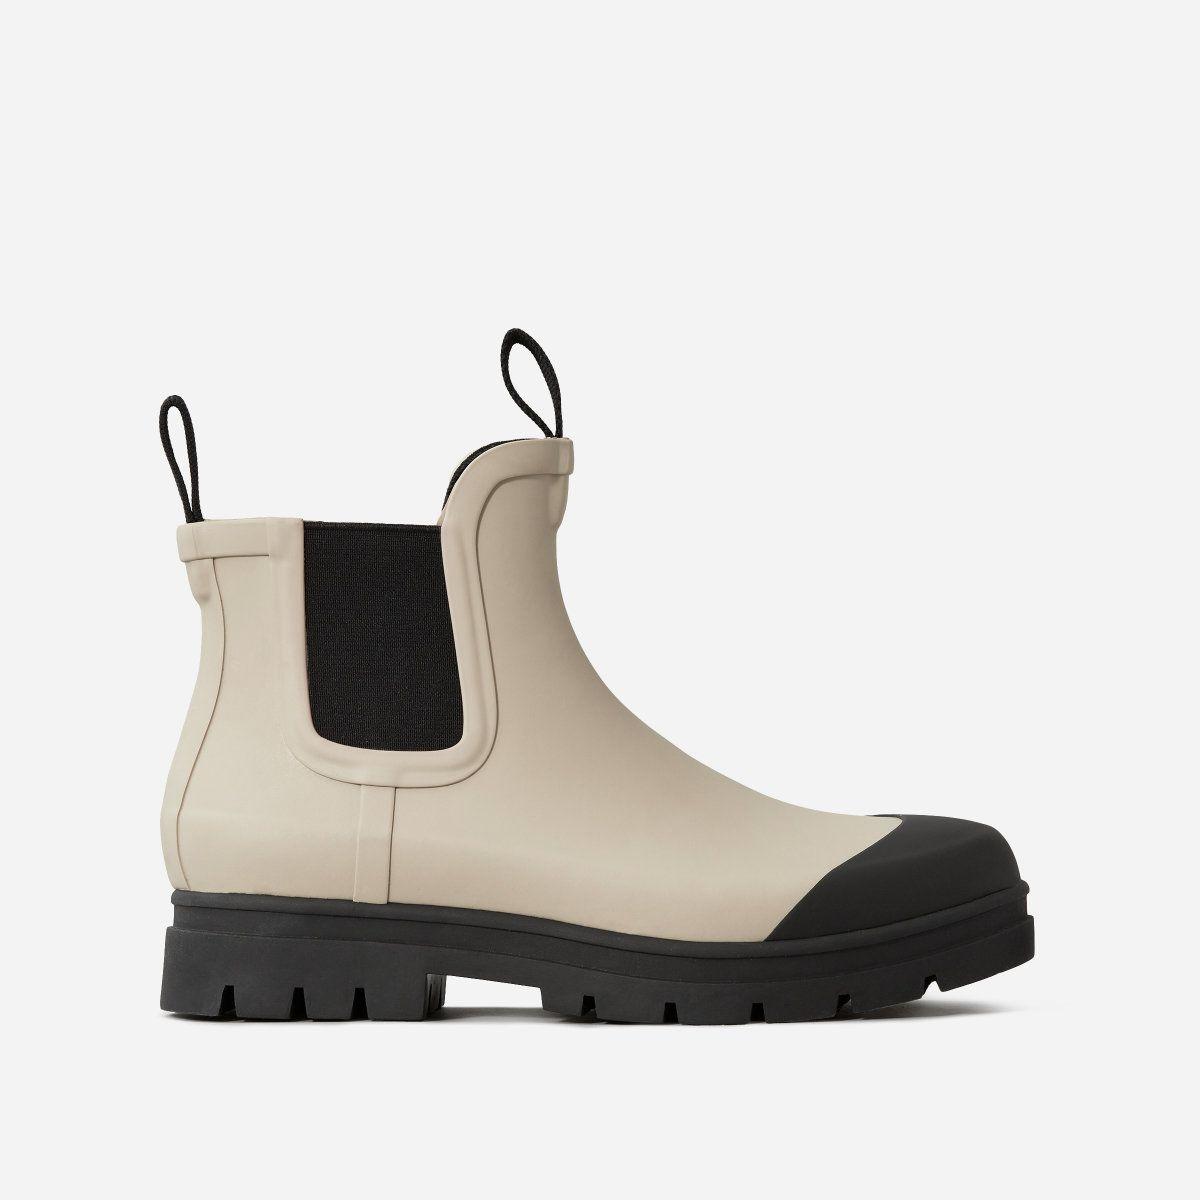 13 Best Stylish Rain Boots For Women